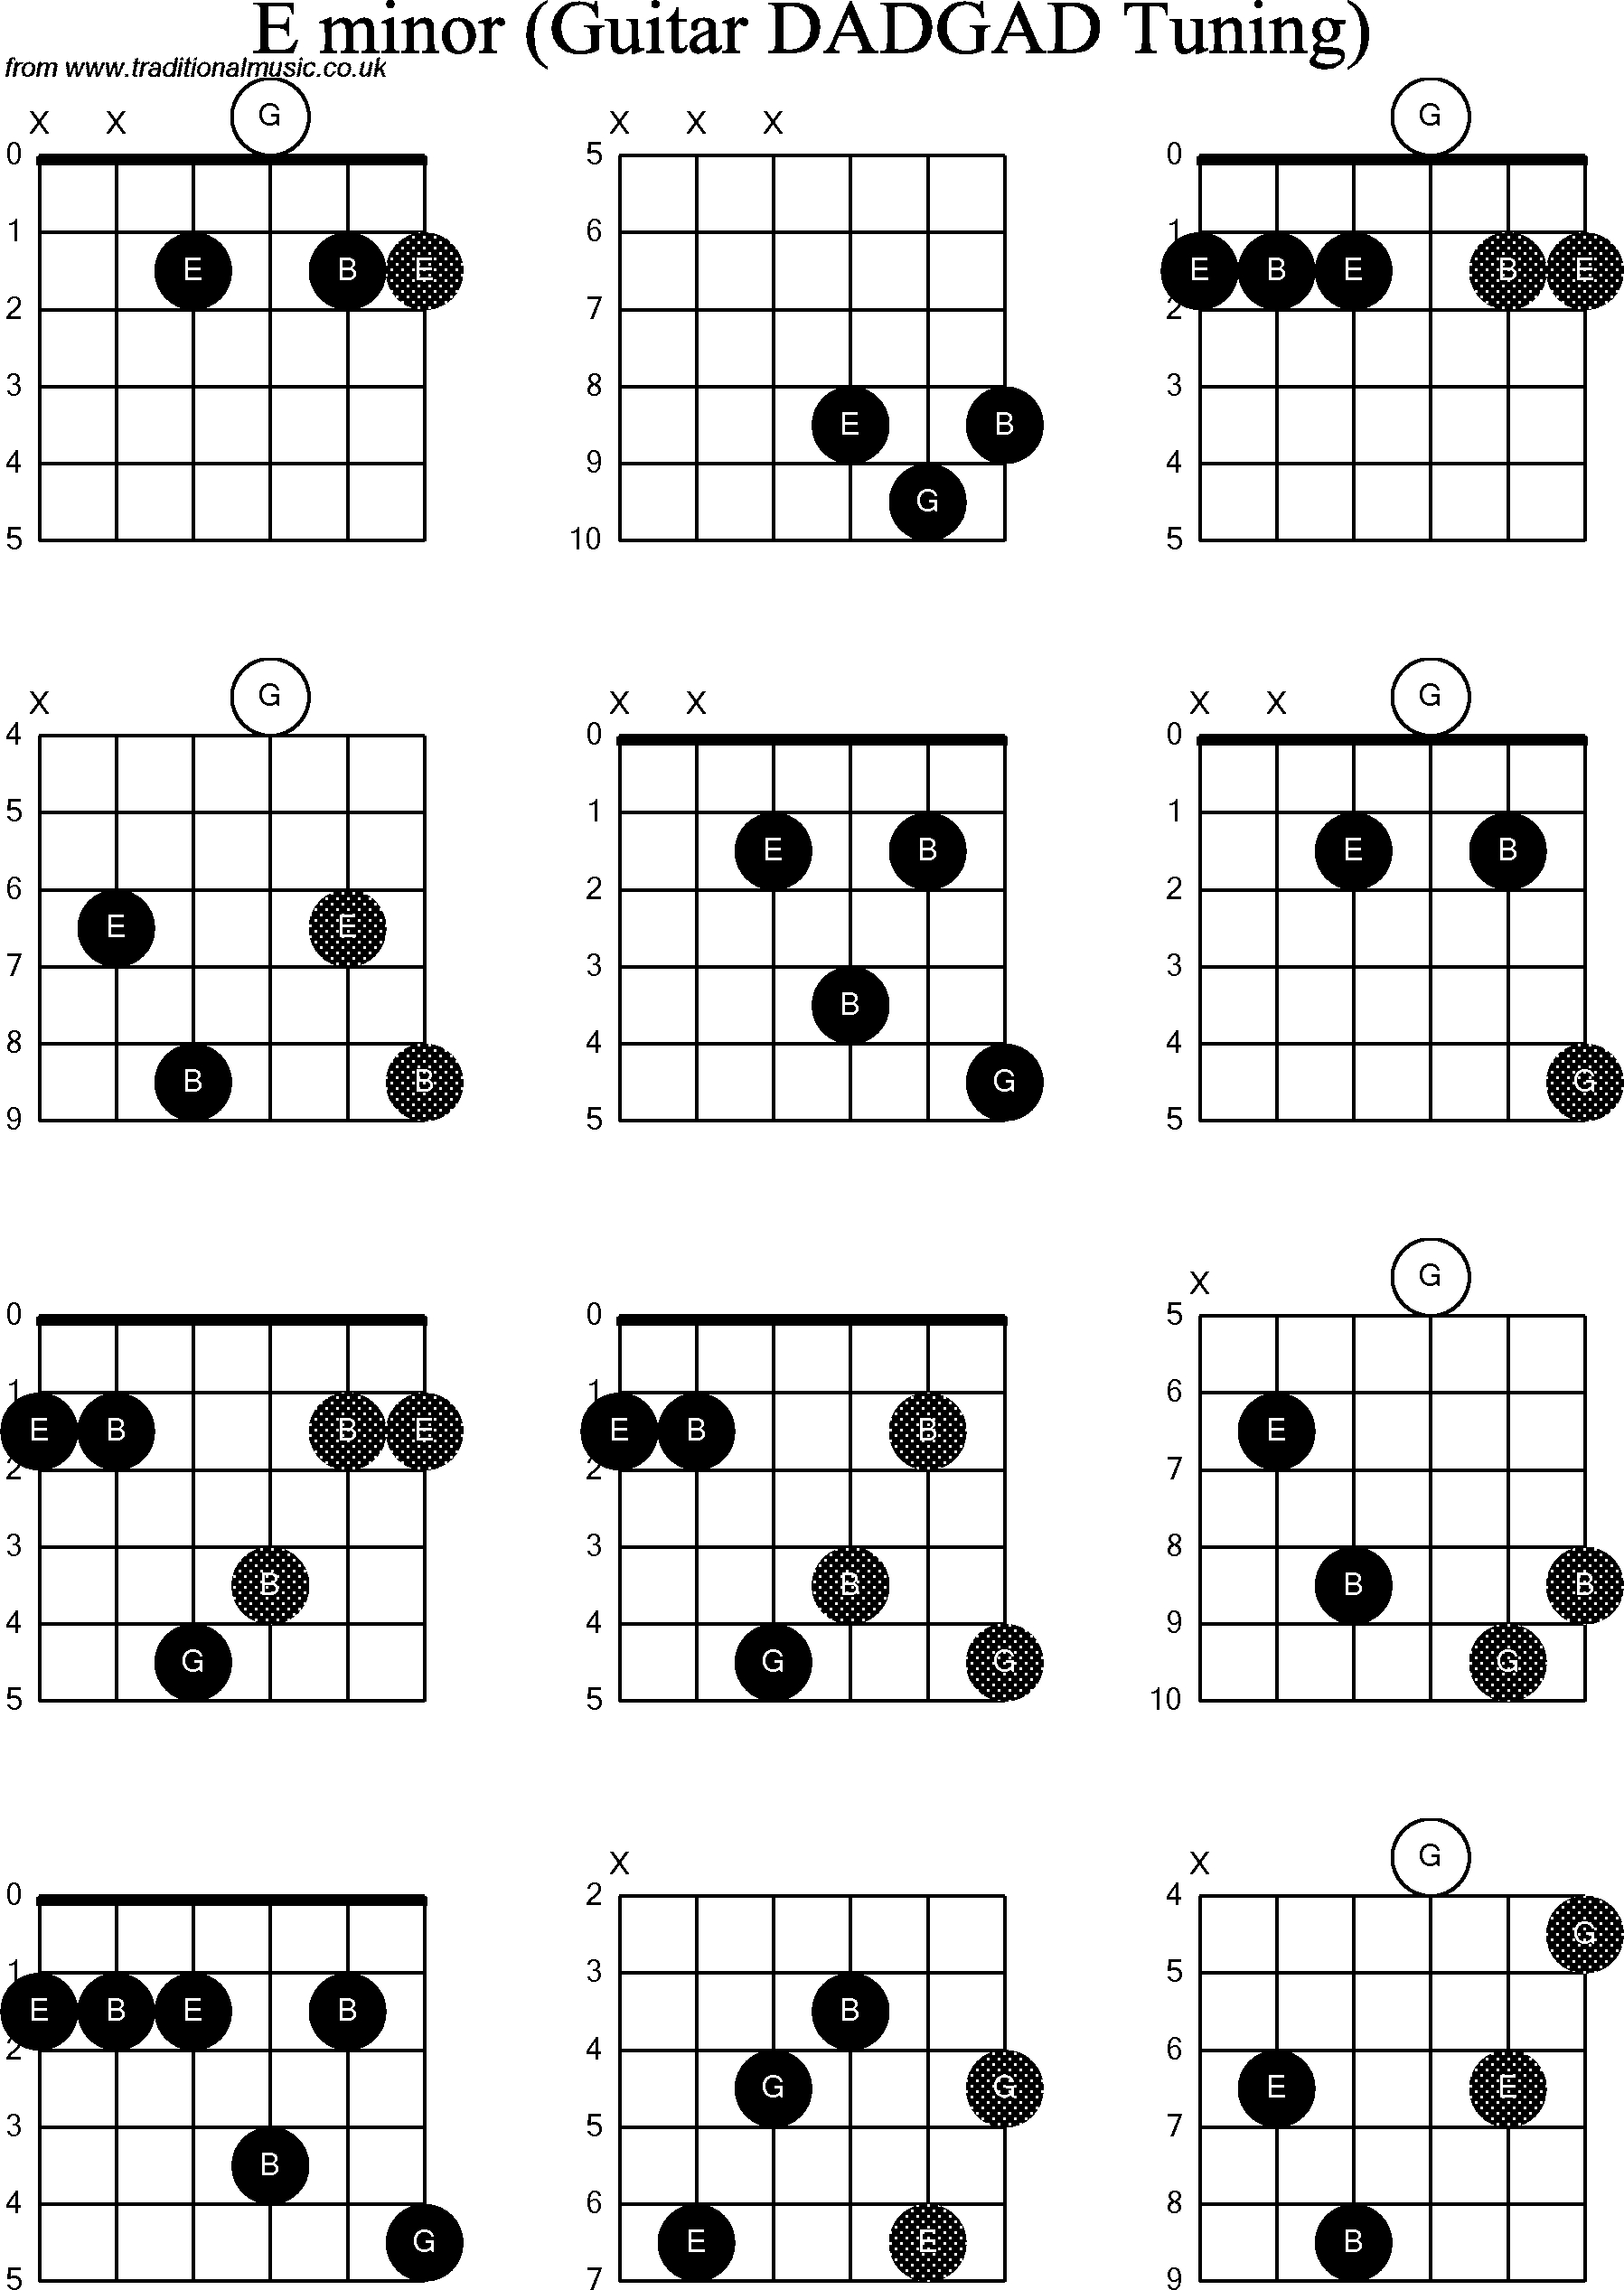 E Minor Chord Chord Diagrams D Modal Guitar Dadgad E Minor